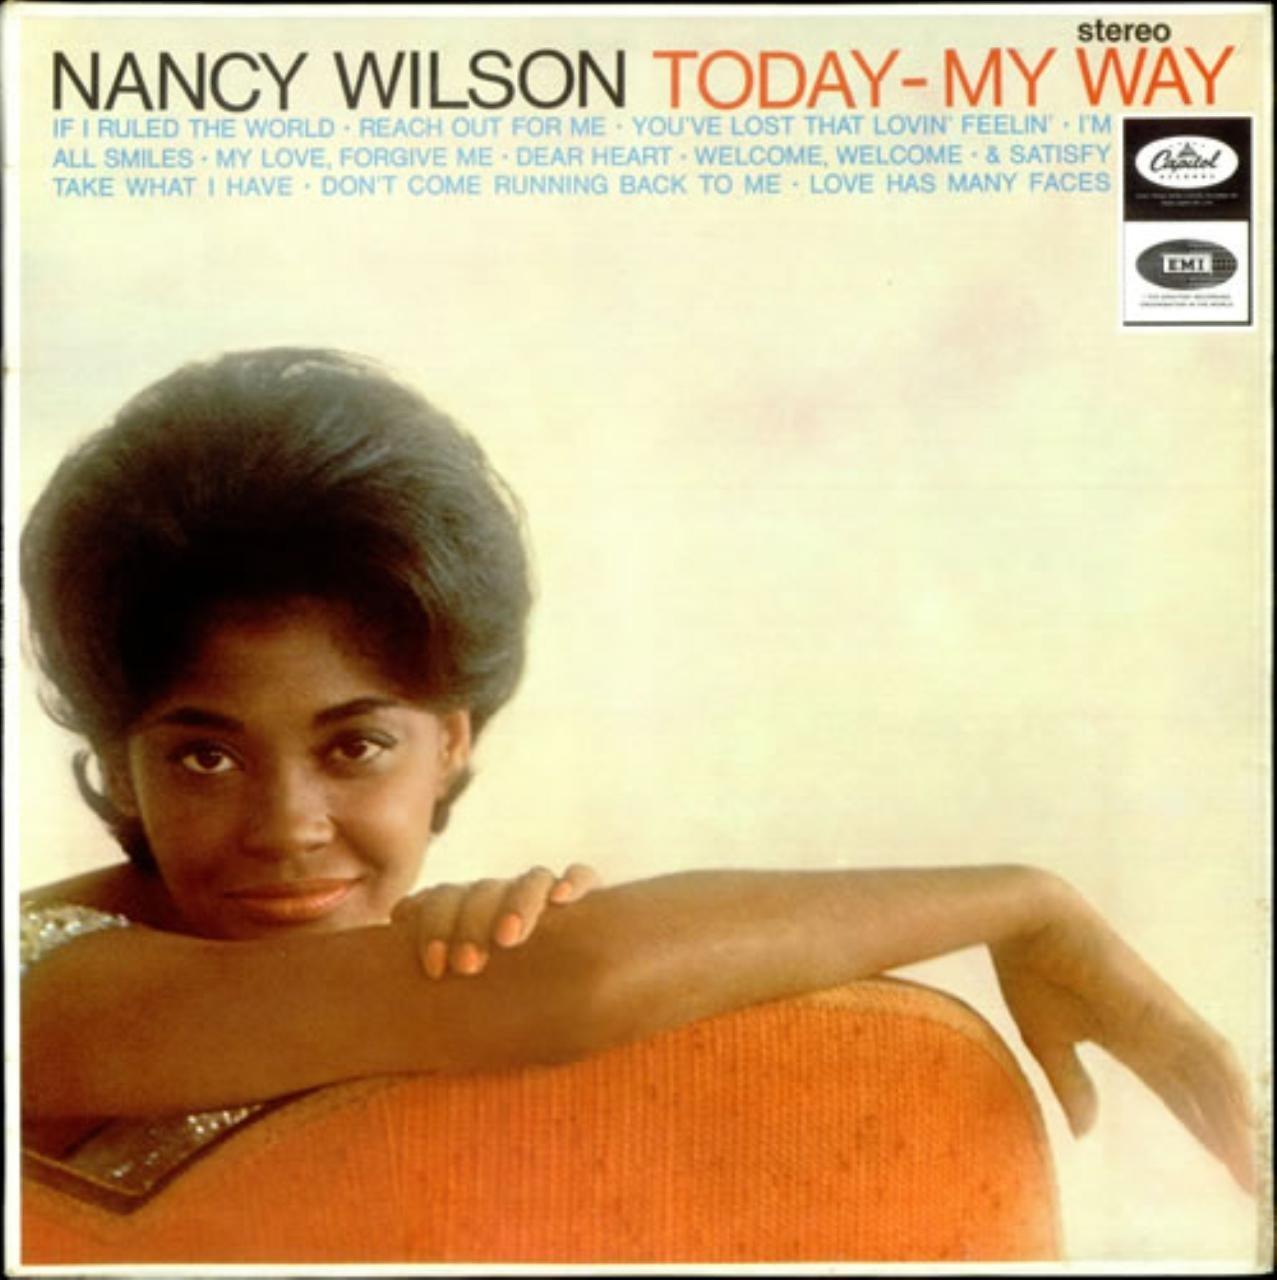 nancy wilson today my way.jpg